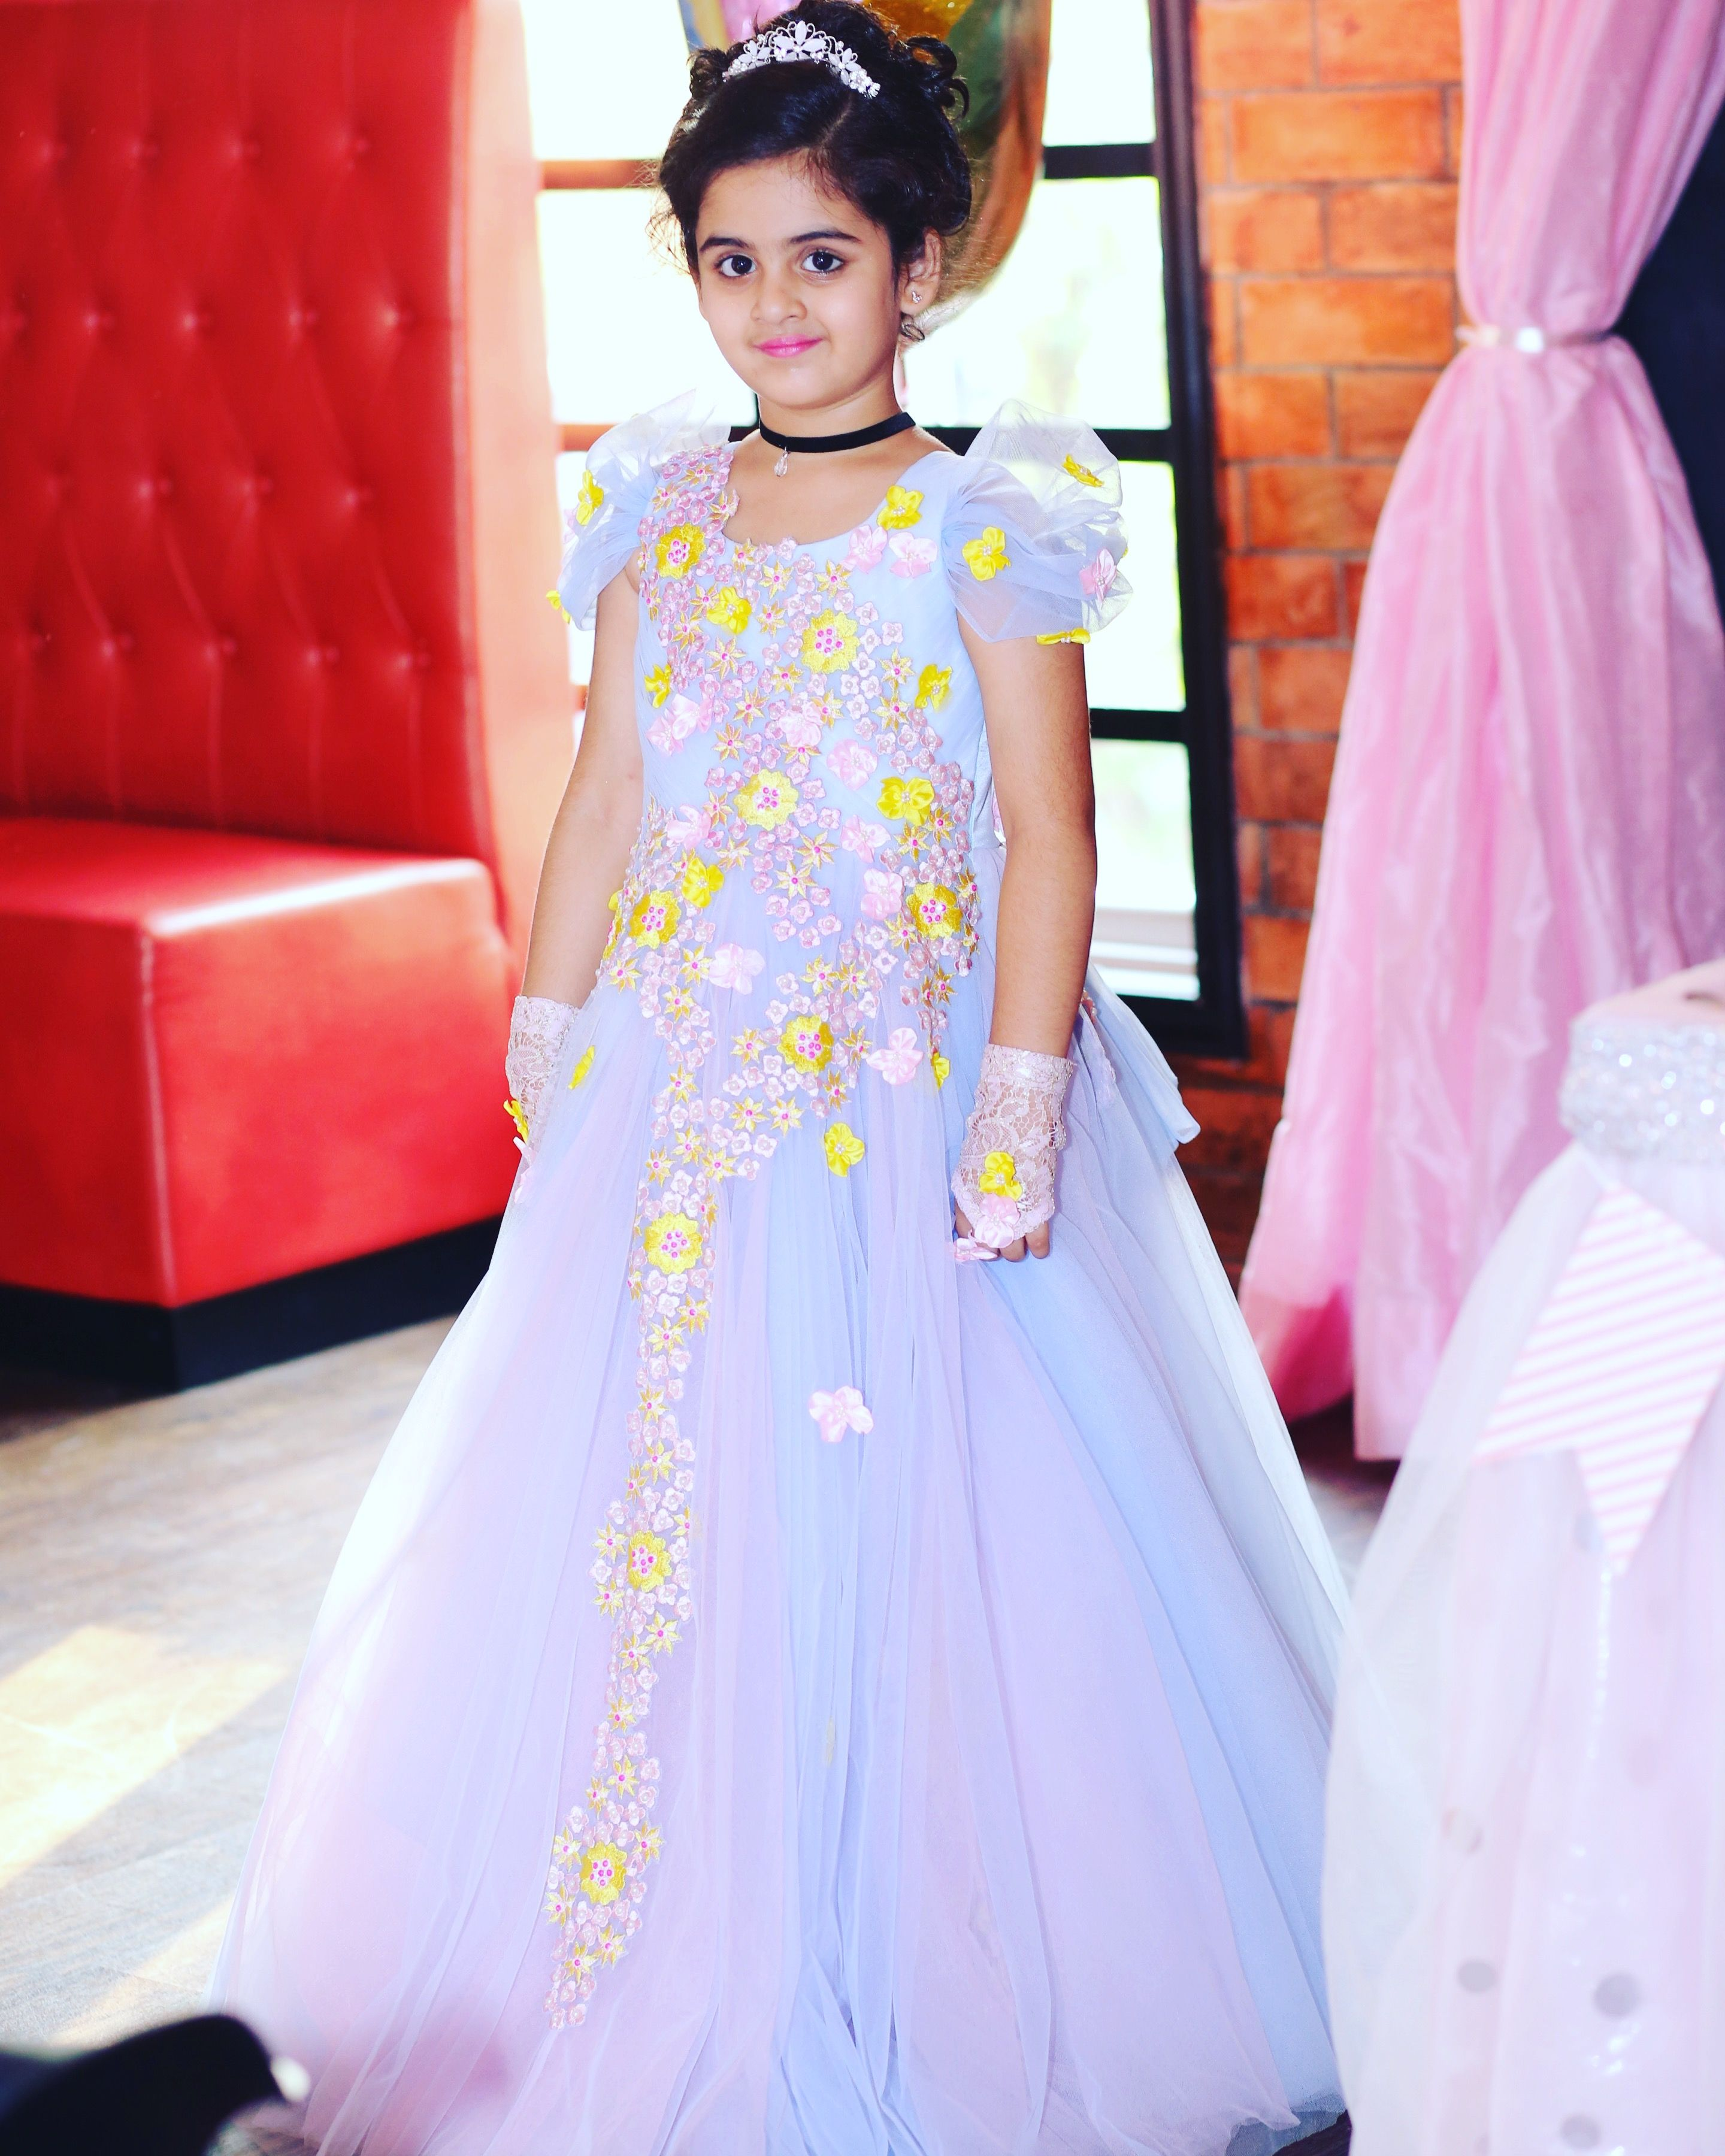 815fe541f8c307 Cinderella Disney Inspired Princess Gown